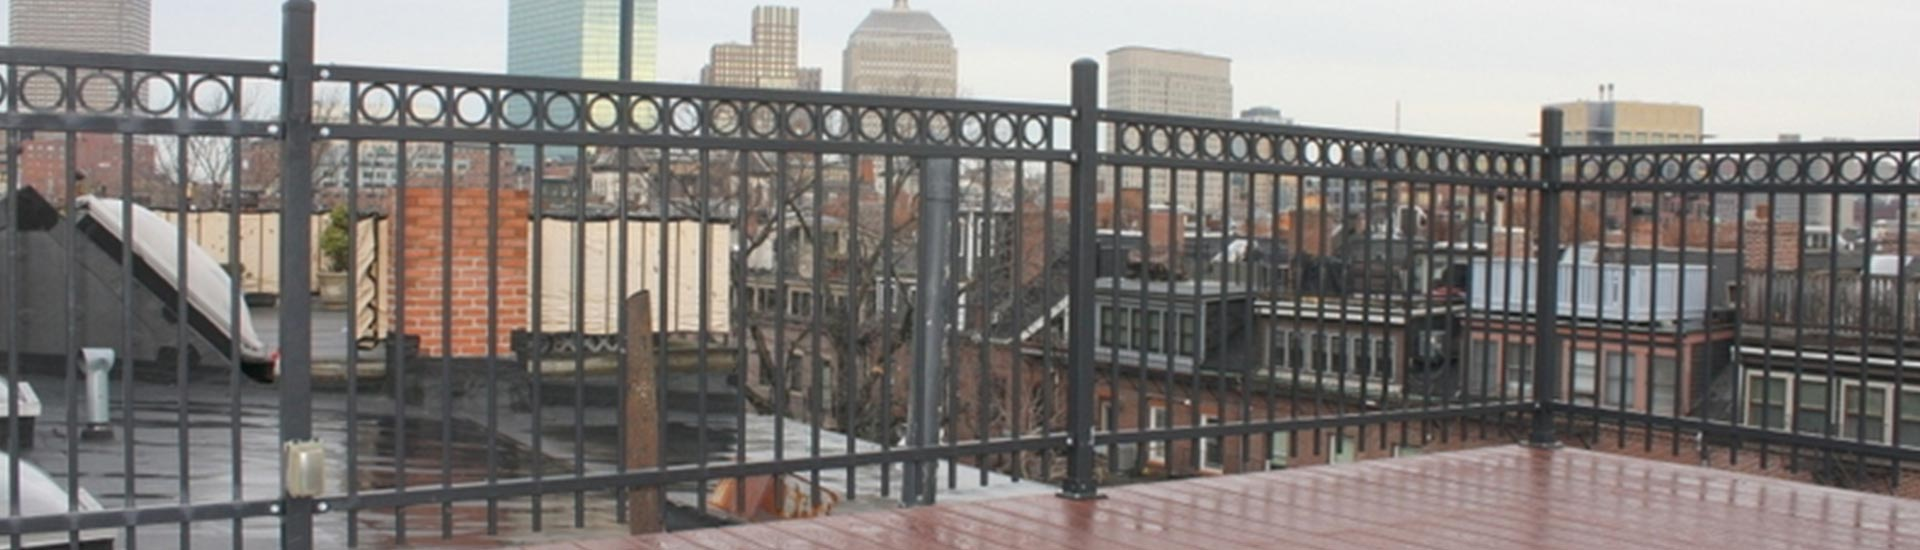 roof-deck-7